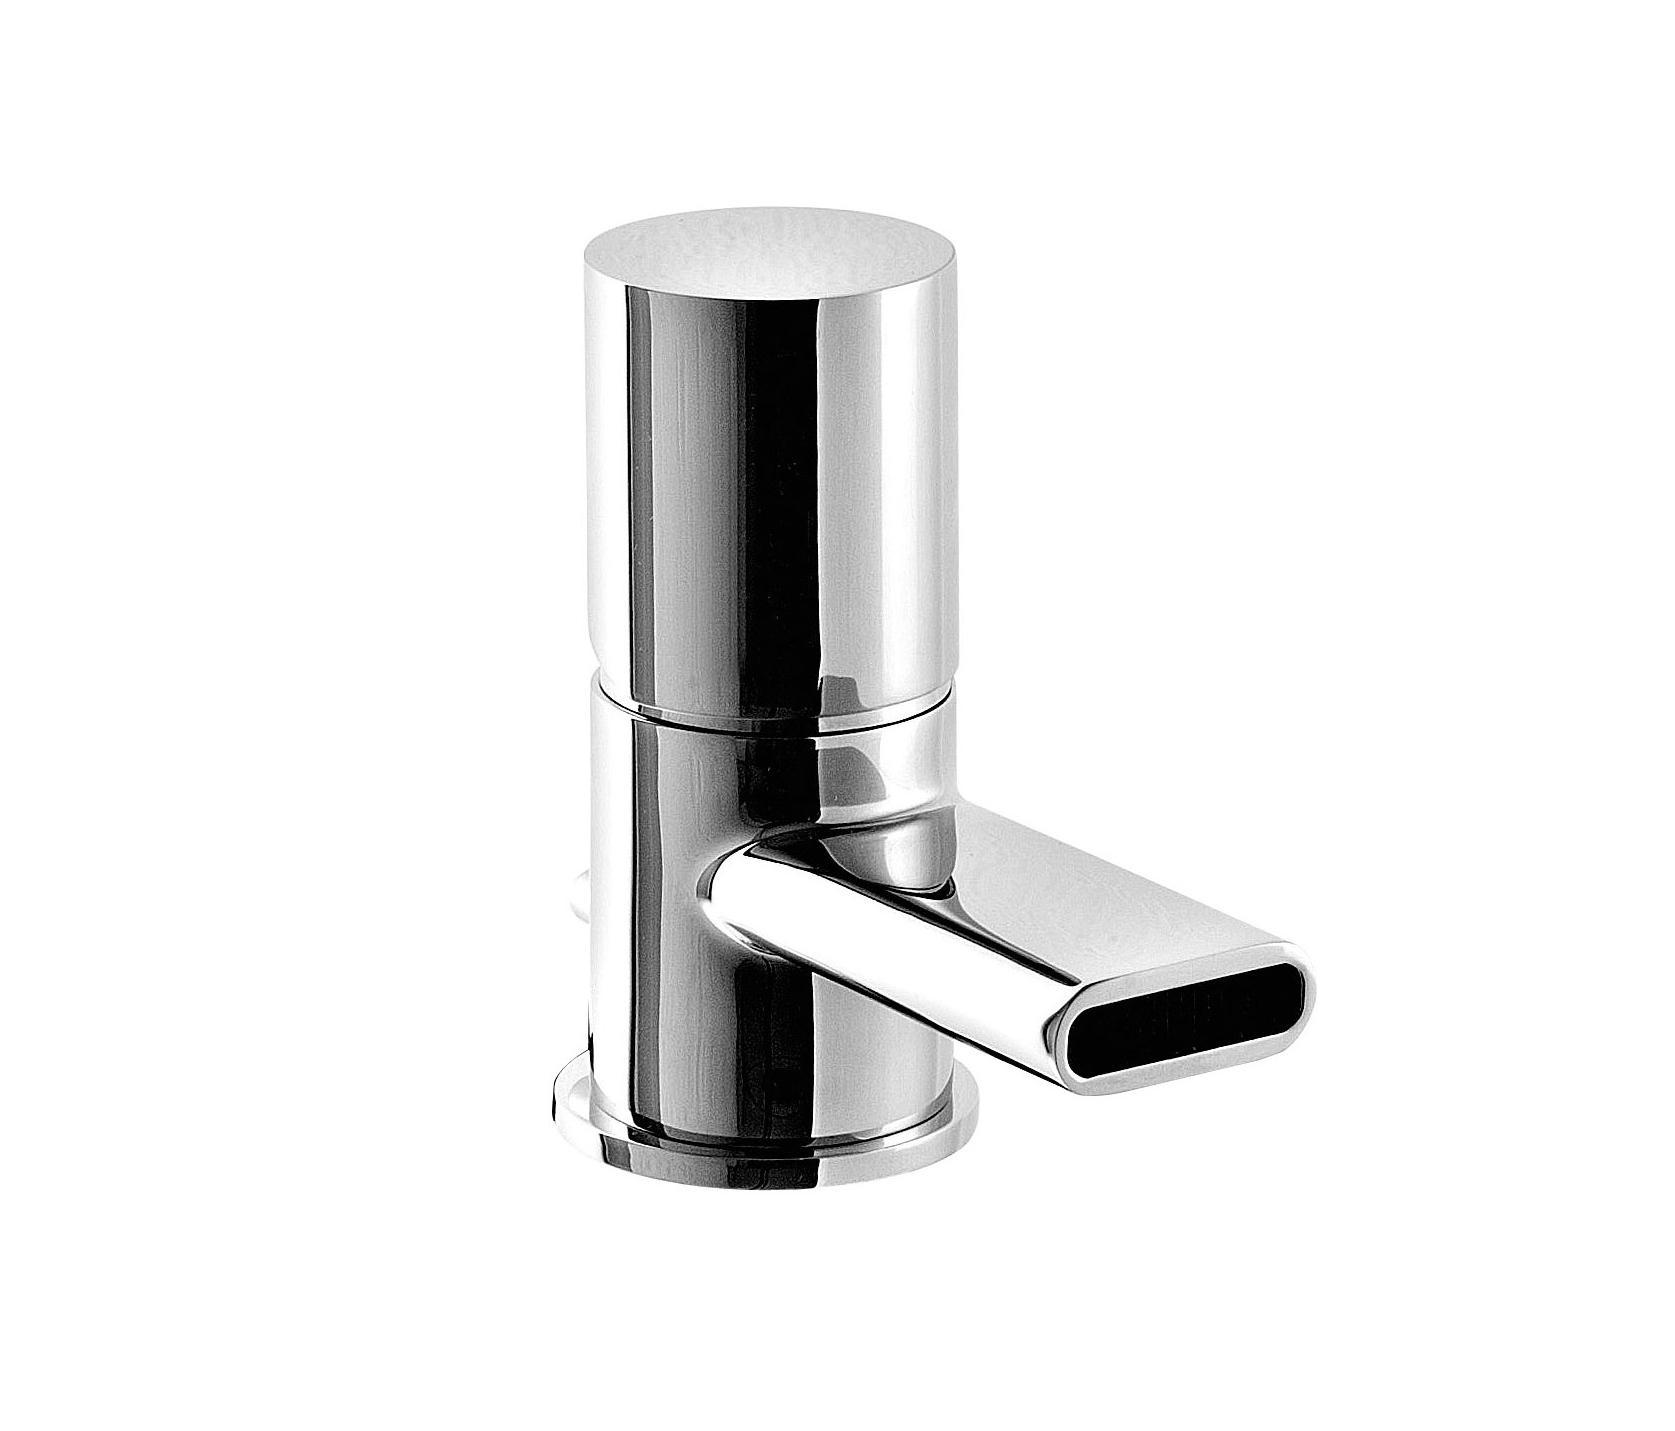 NANOTECH 5410 - Wash-basin taps from Rubinetterie Treemme | Architonic